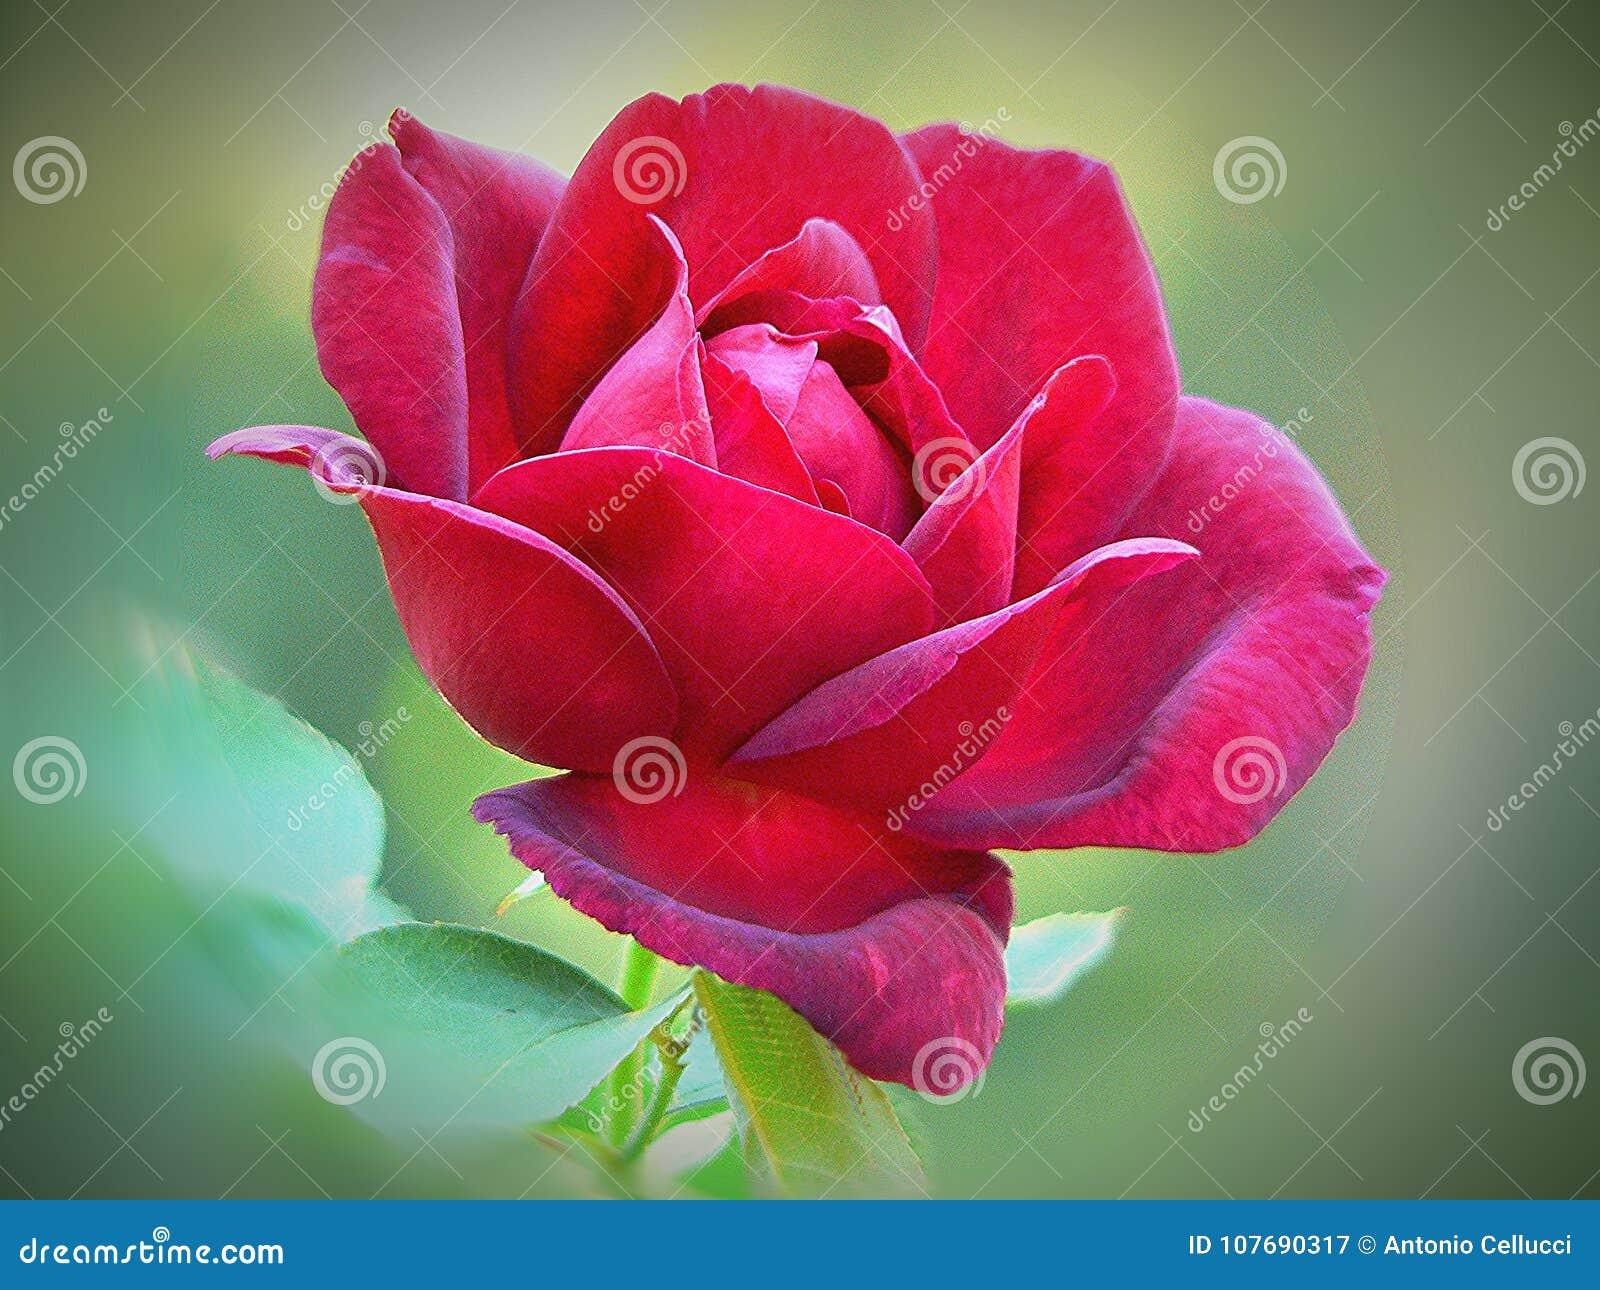 Red Rose Flower of Love